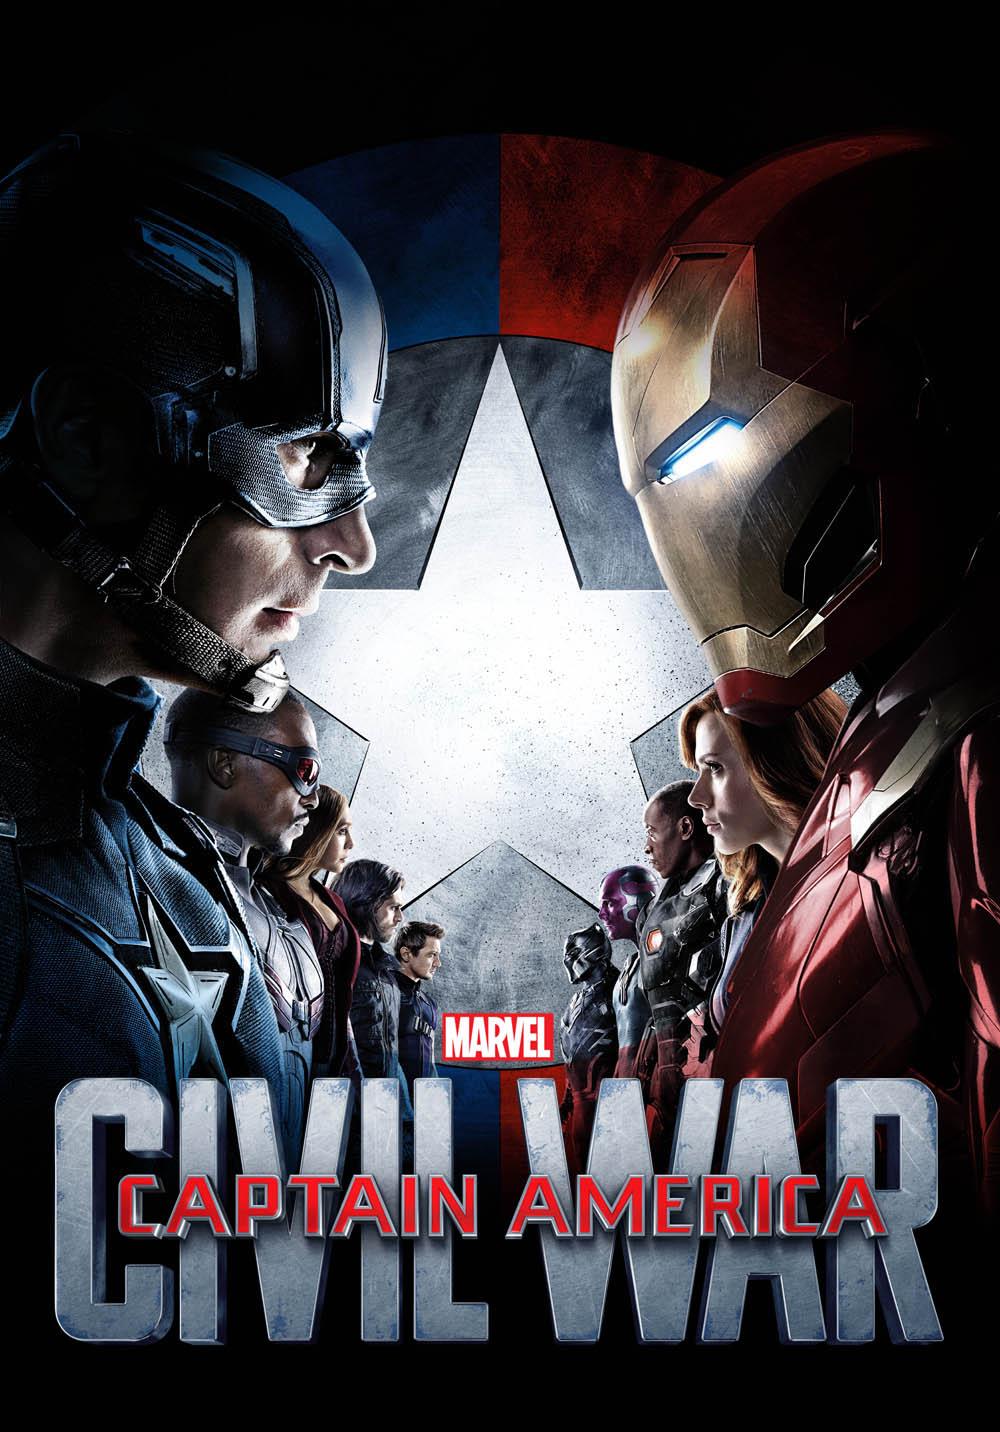 download film captain america civil war (2016) 720p hdtc subtitle